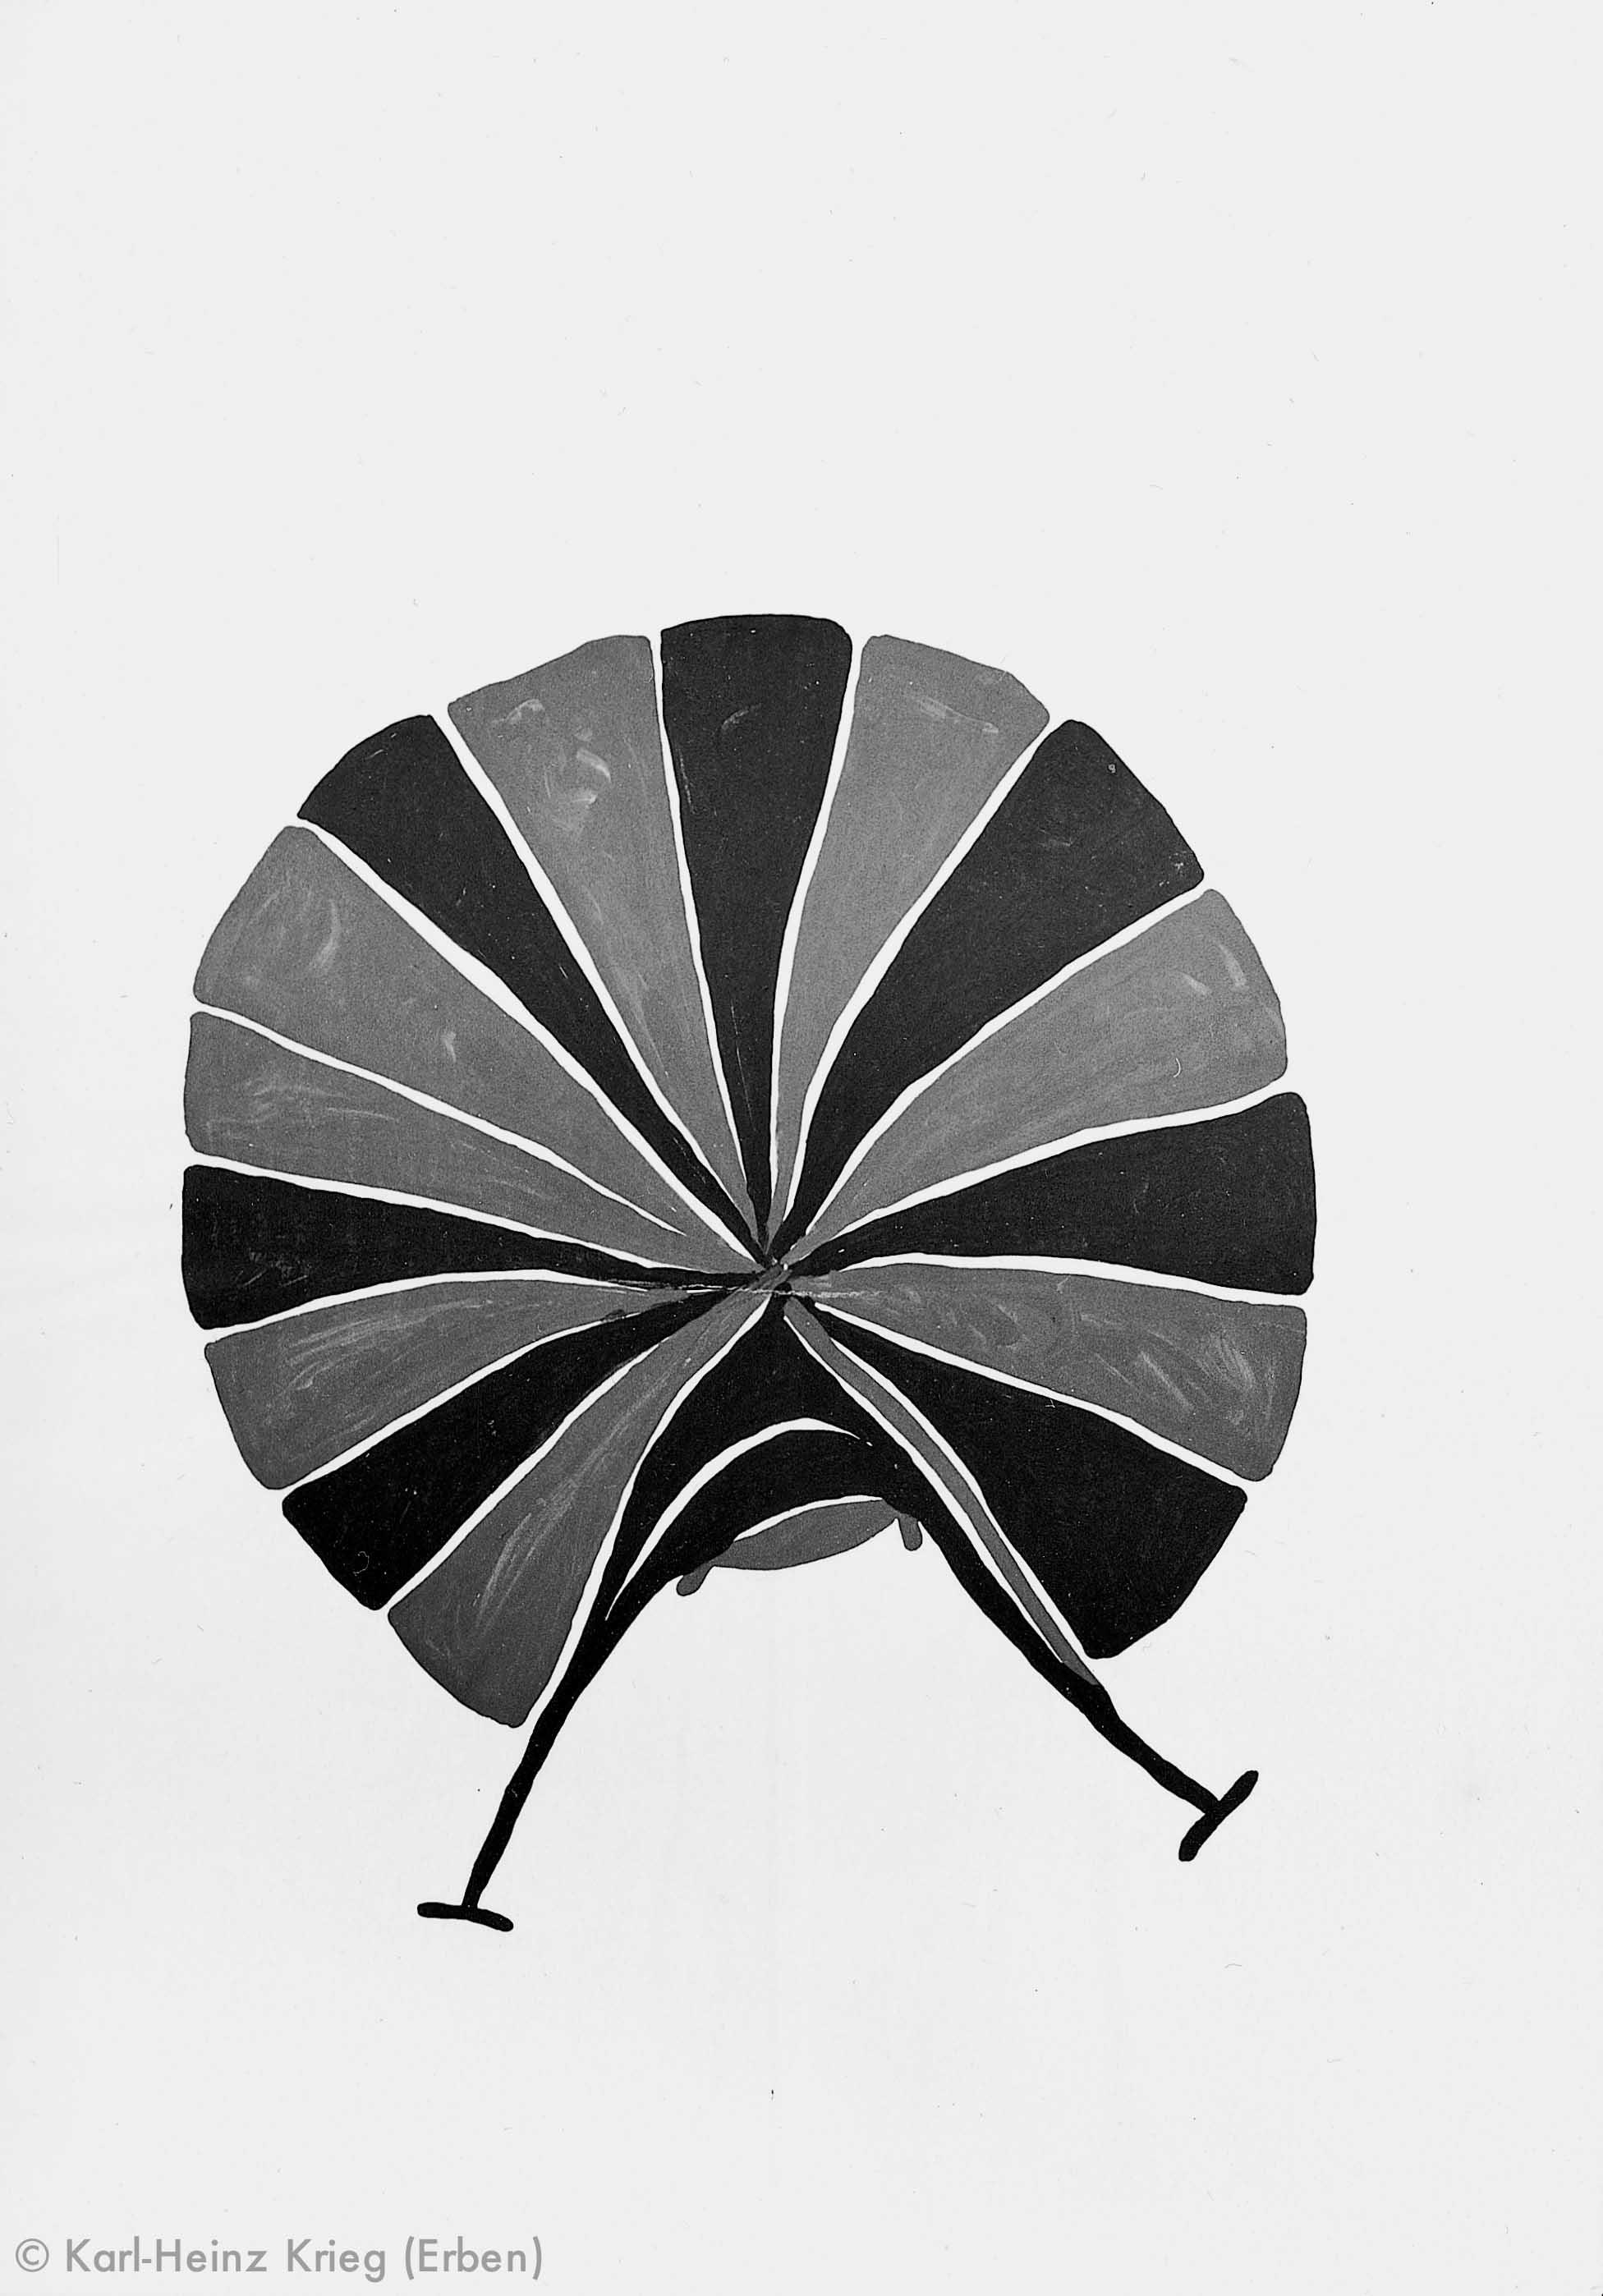 Gaou Béavogi Gozodaagi (Motiv des Gozo-Blattes), 1989 Dispersionsfarbe/Papier 59,5 x 42 cm Werknr. 6-1989/31